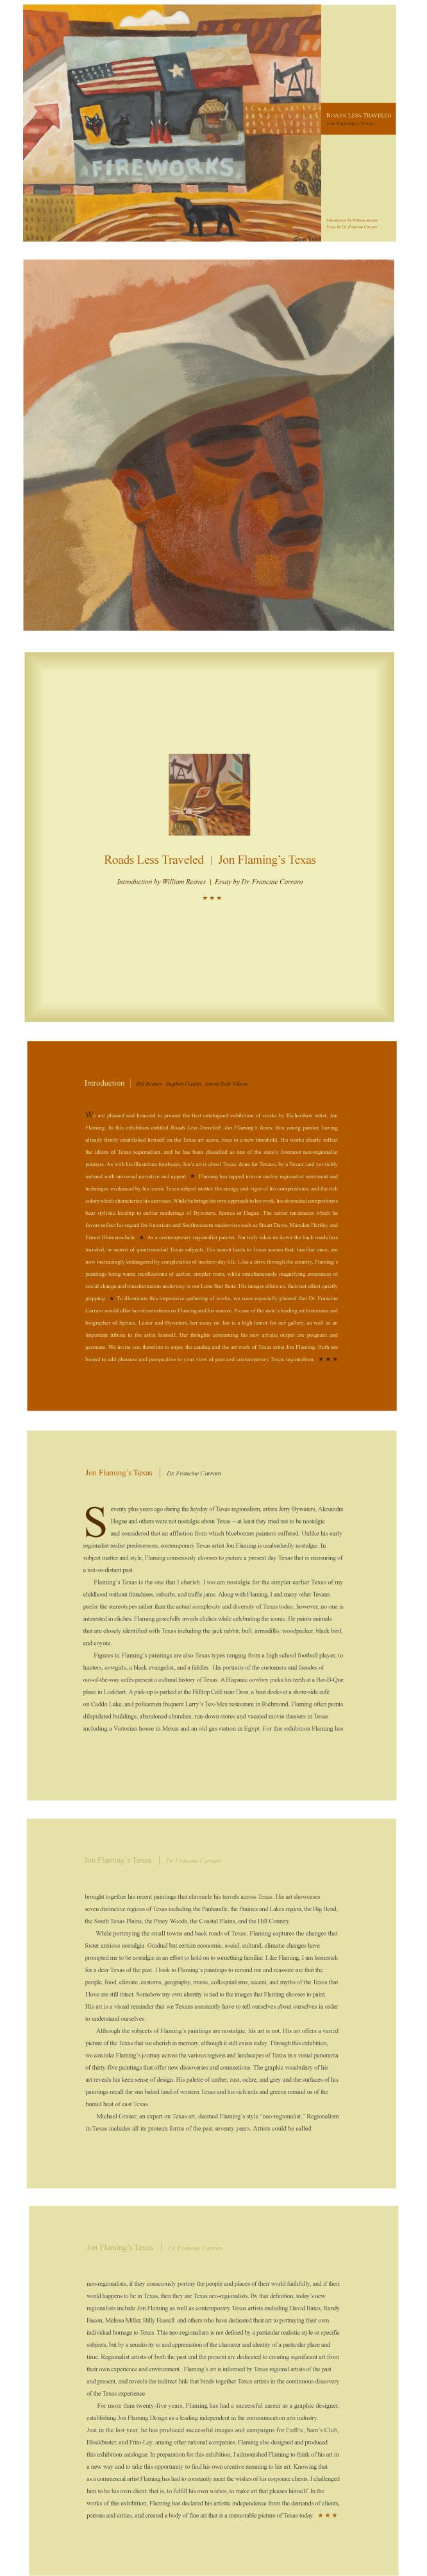 Jon Flaming - Journal - The